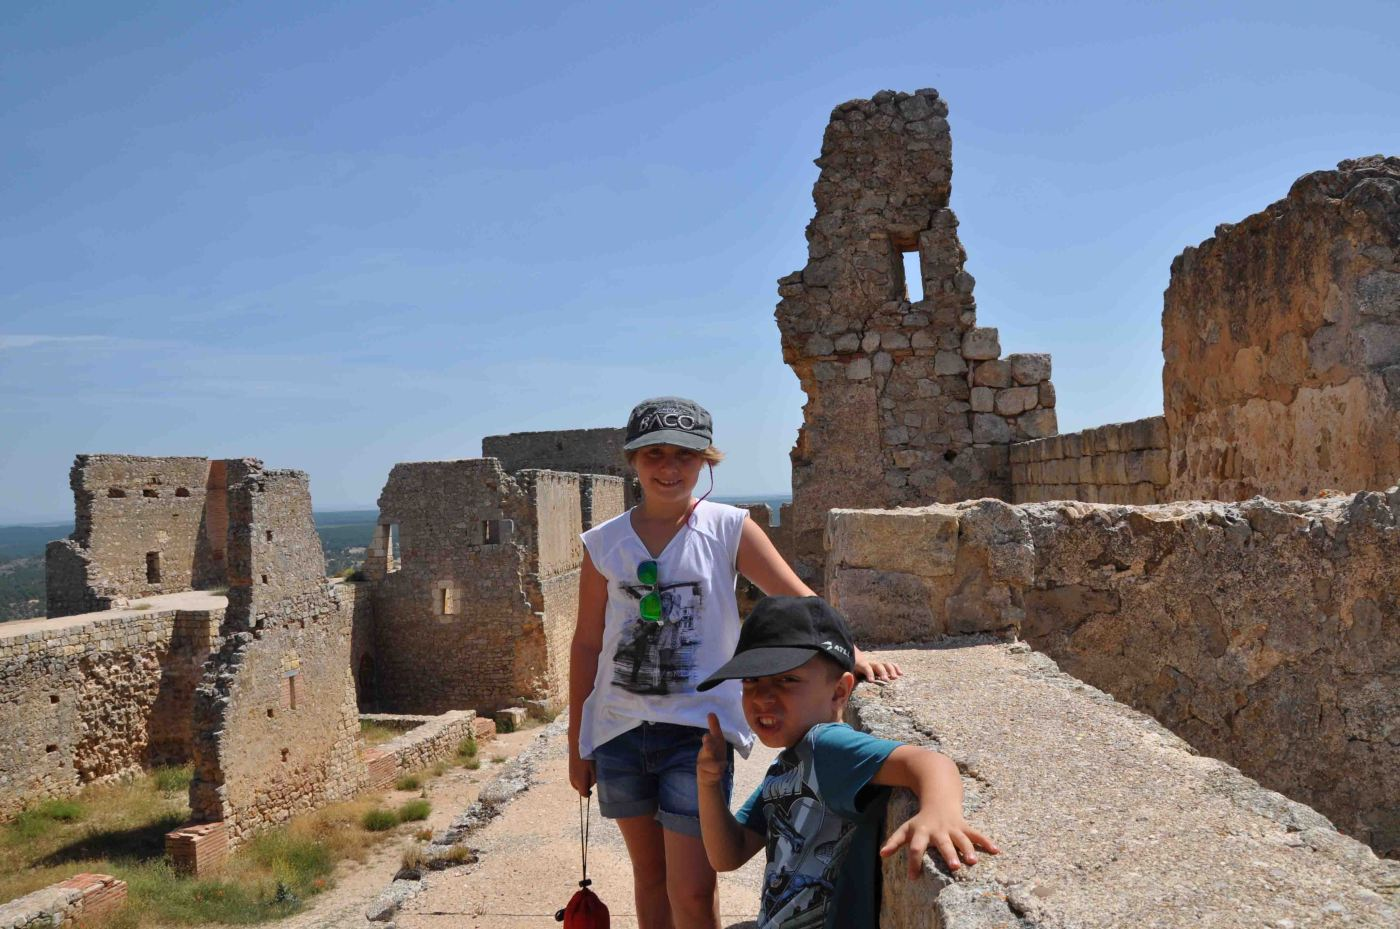 La fortaleza Califal de Gormaz, la mas grande de Europa